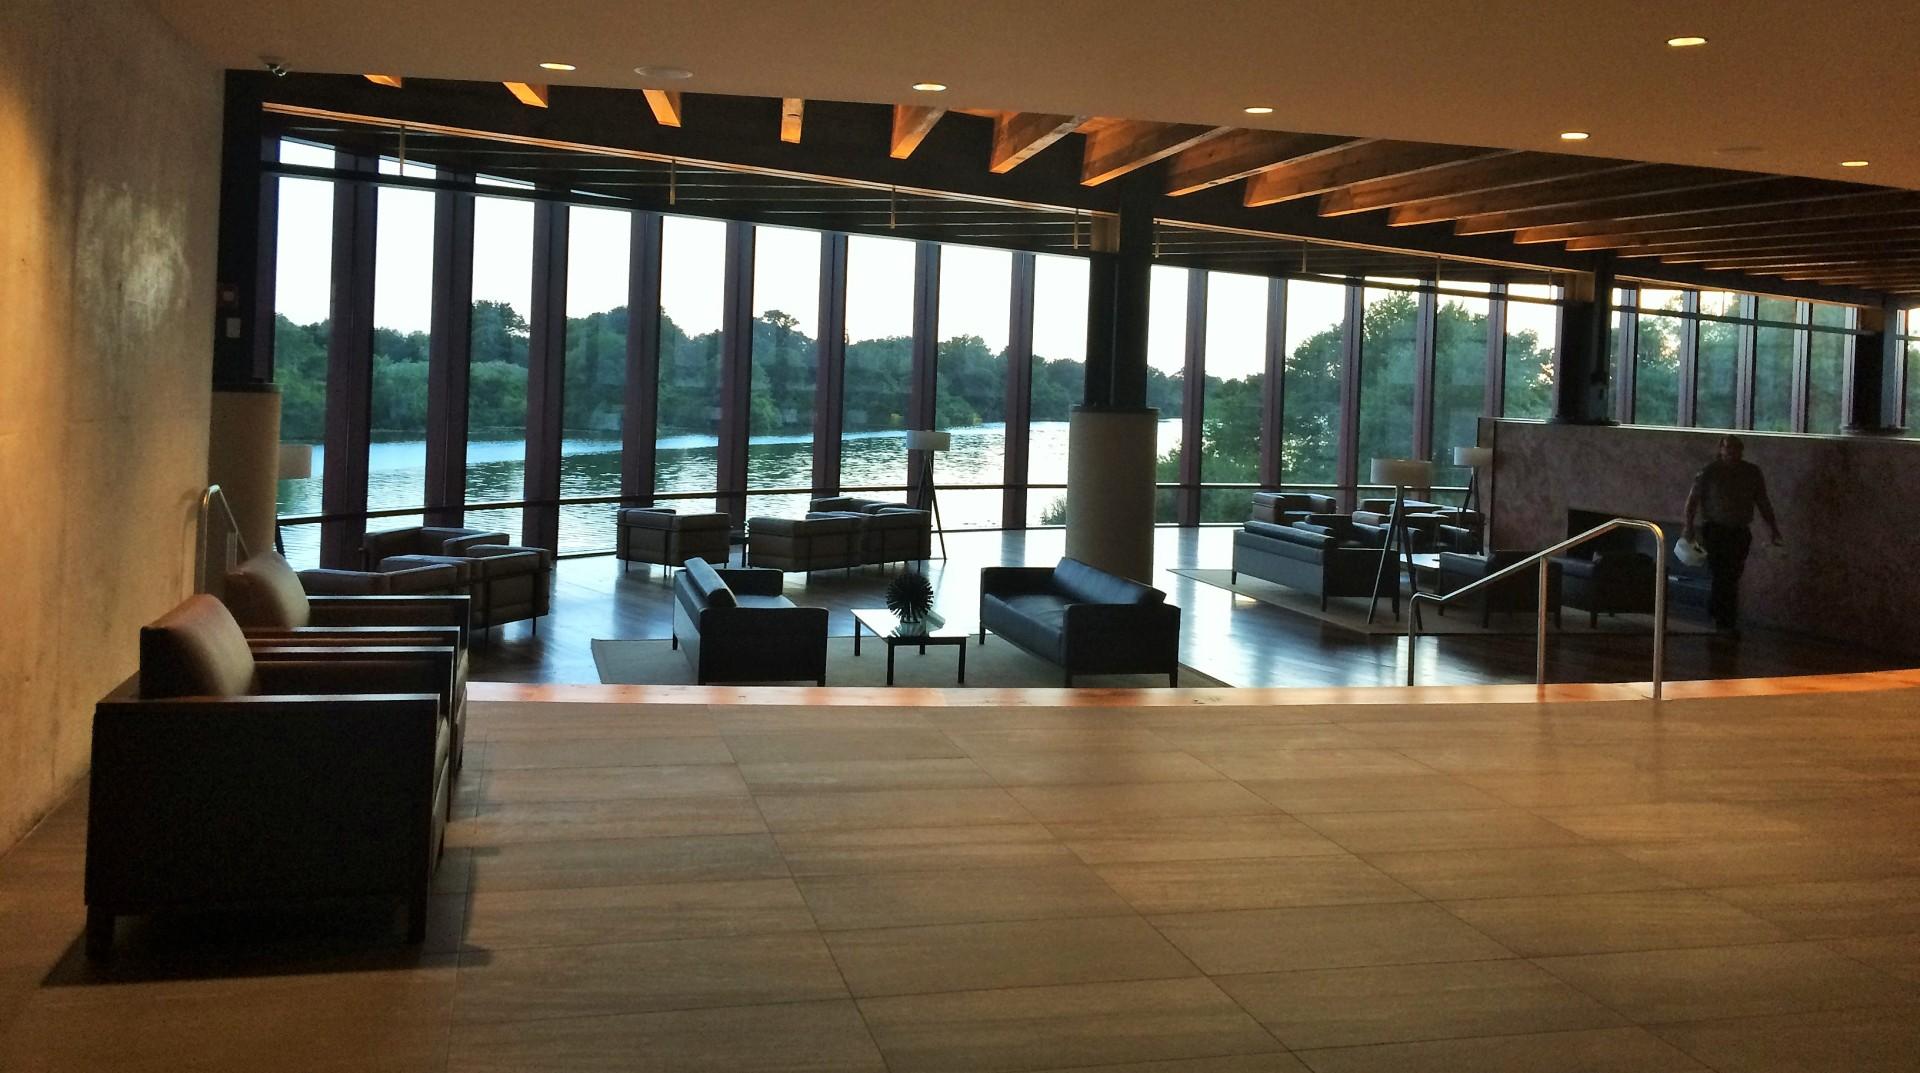 Streamsong's lobby